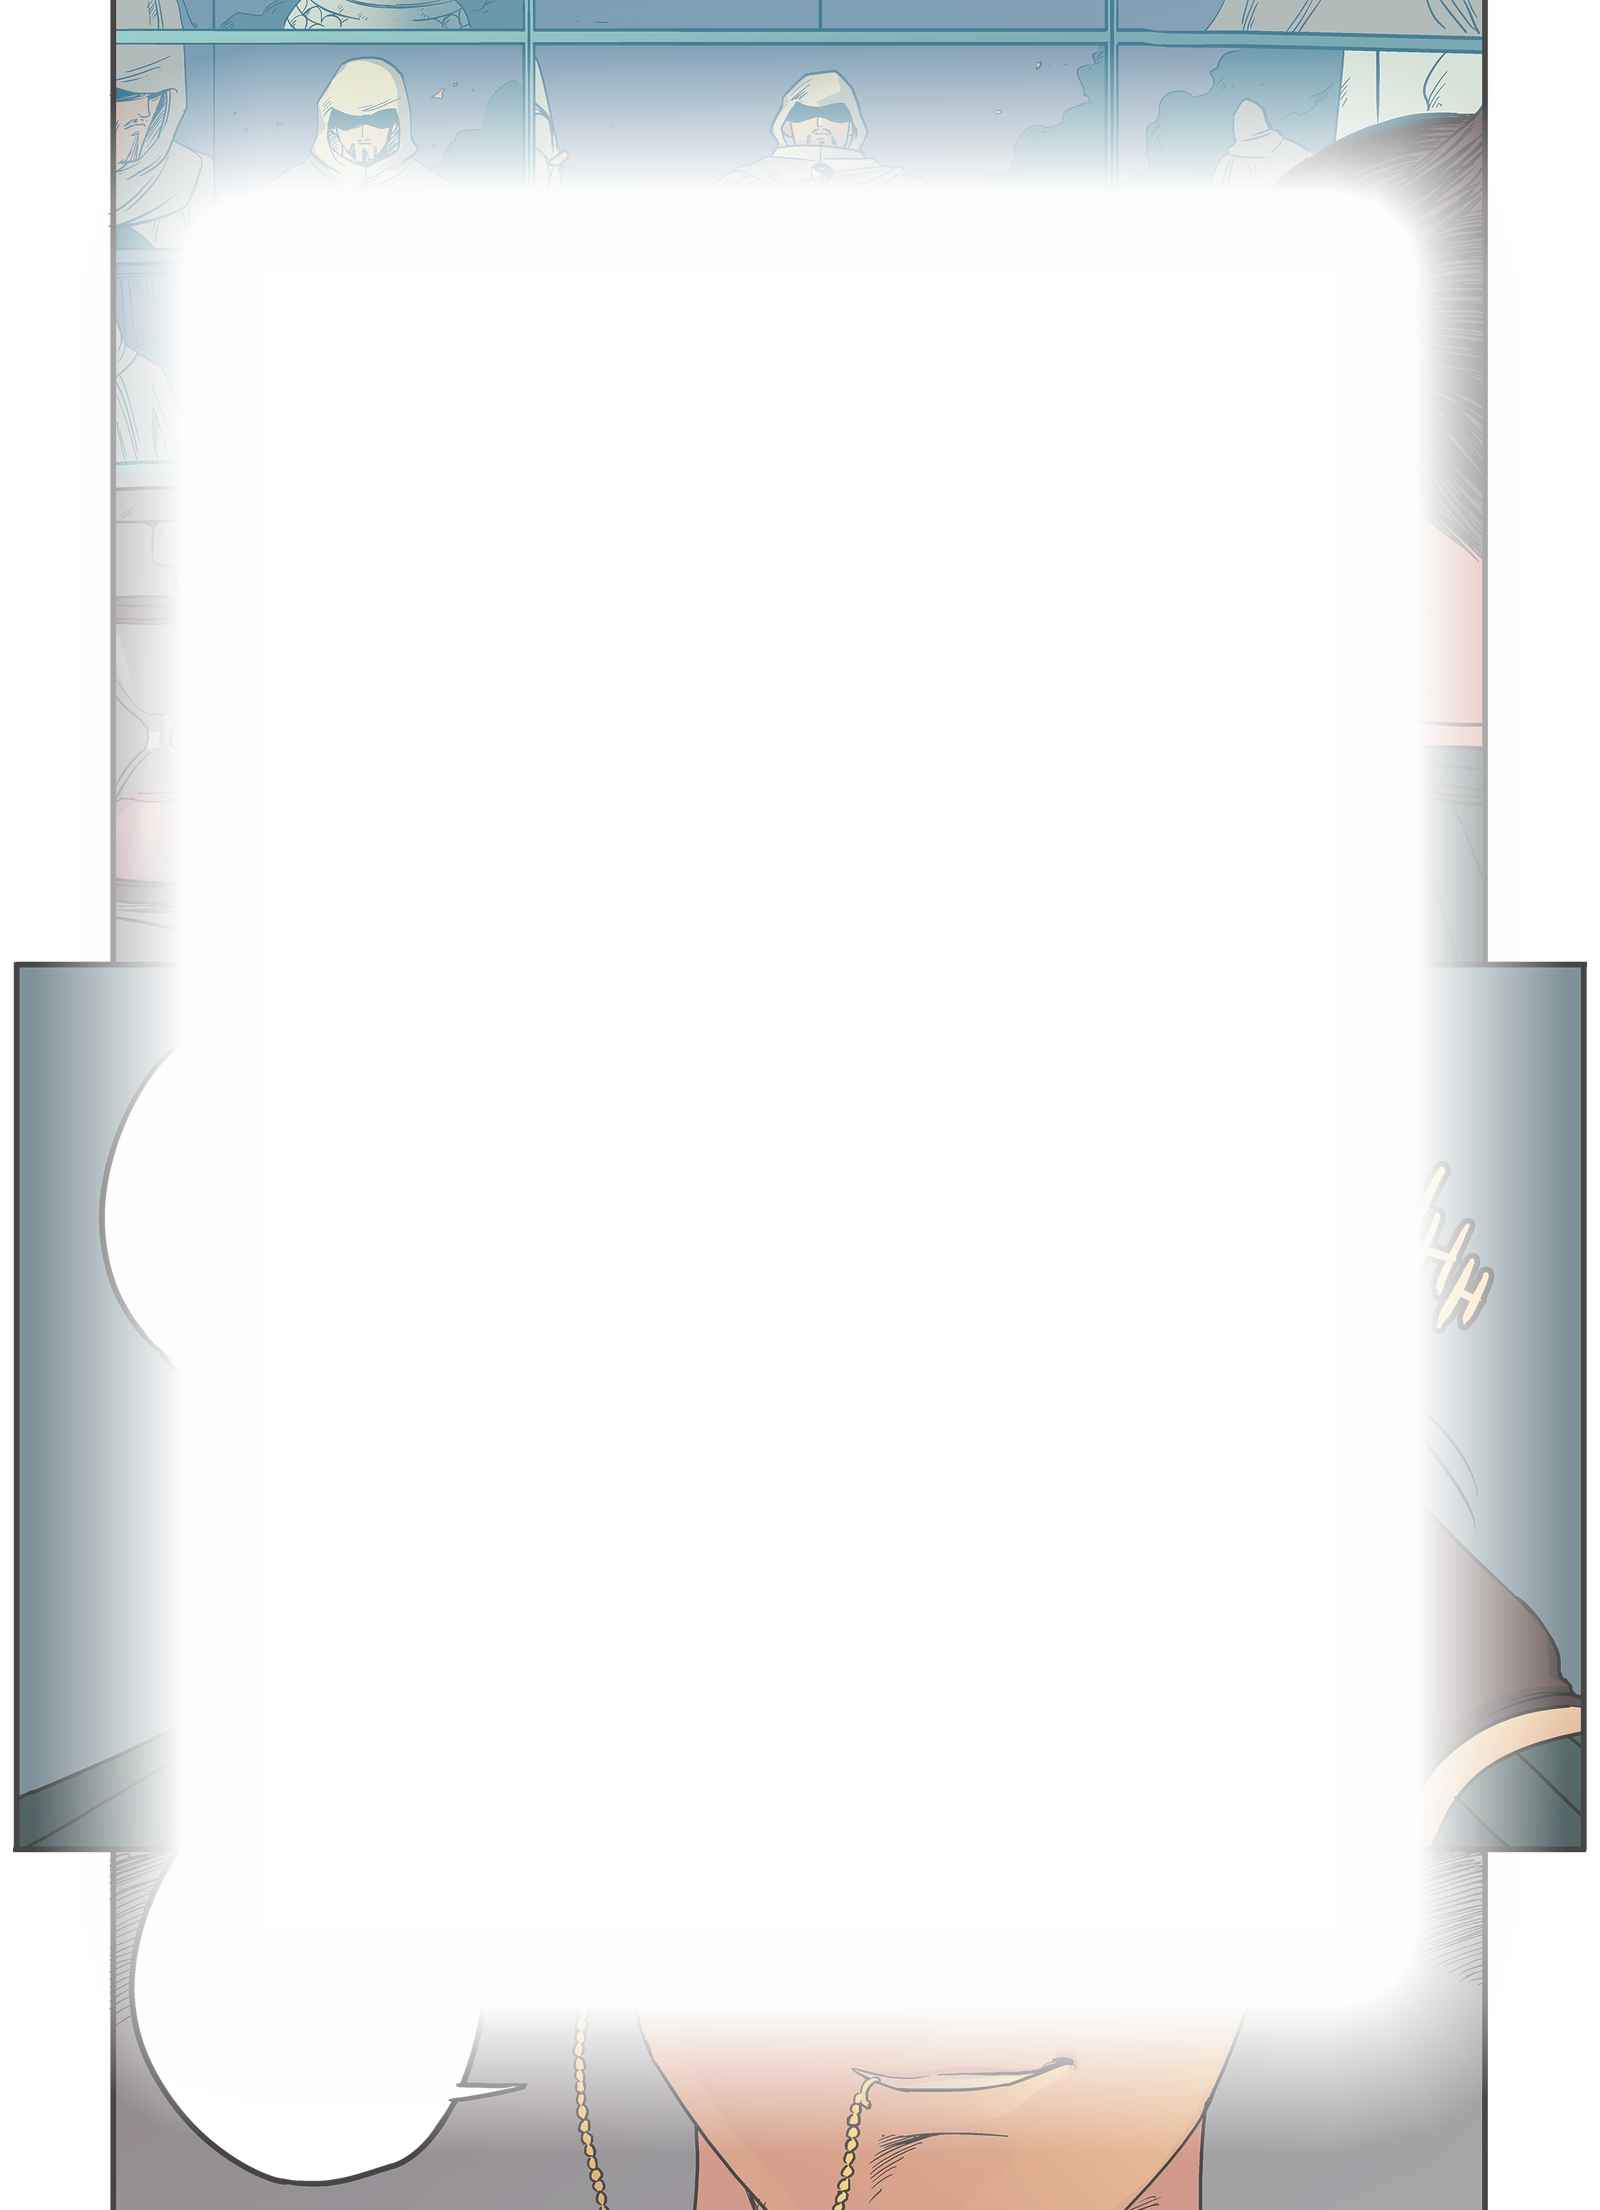 Amilova : チャプター 7 ページ 5